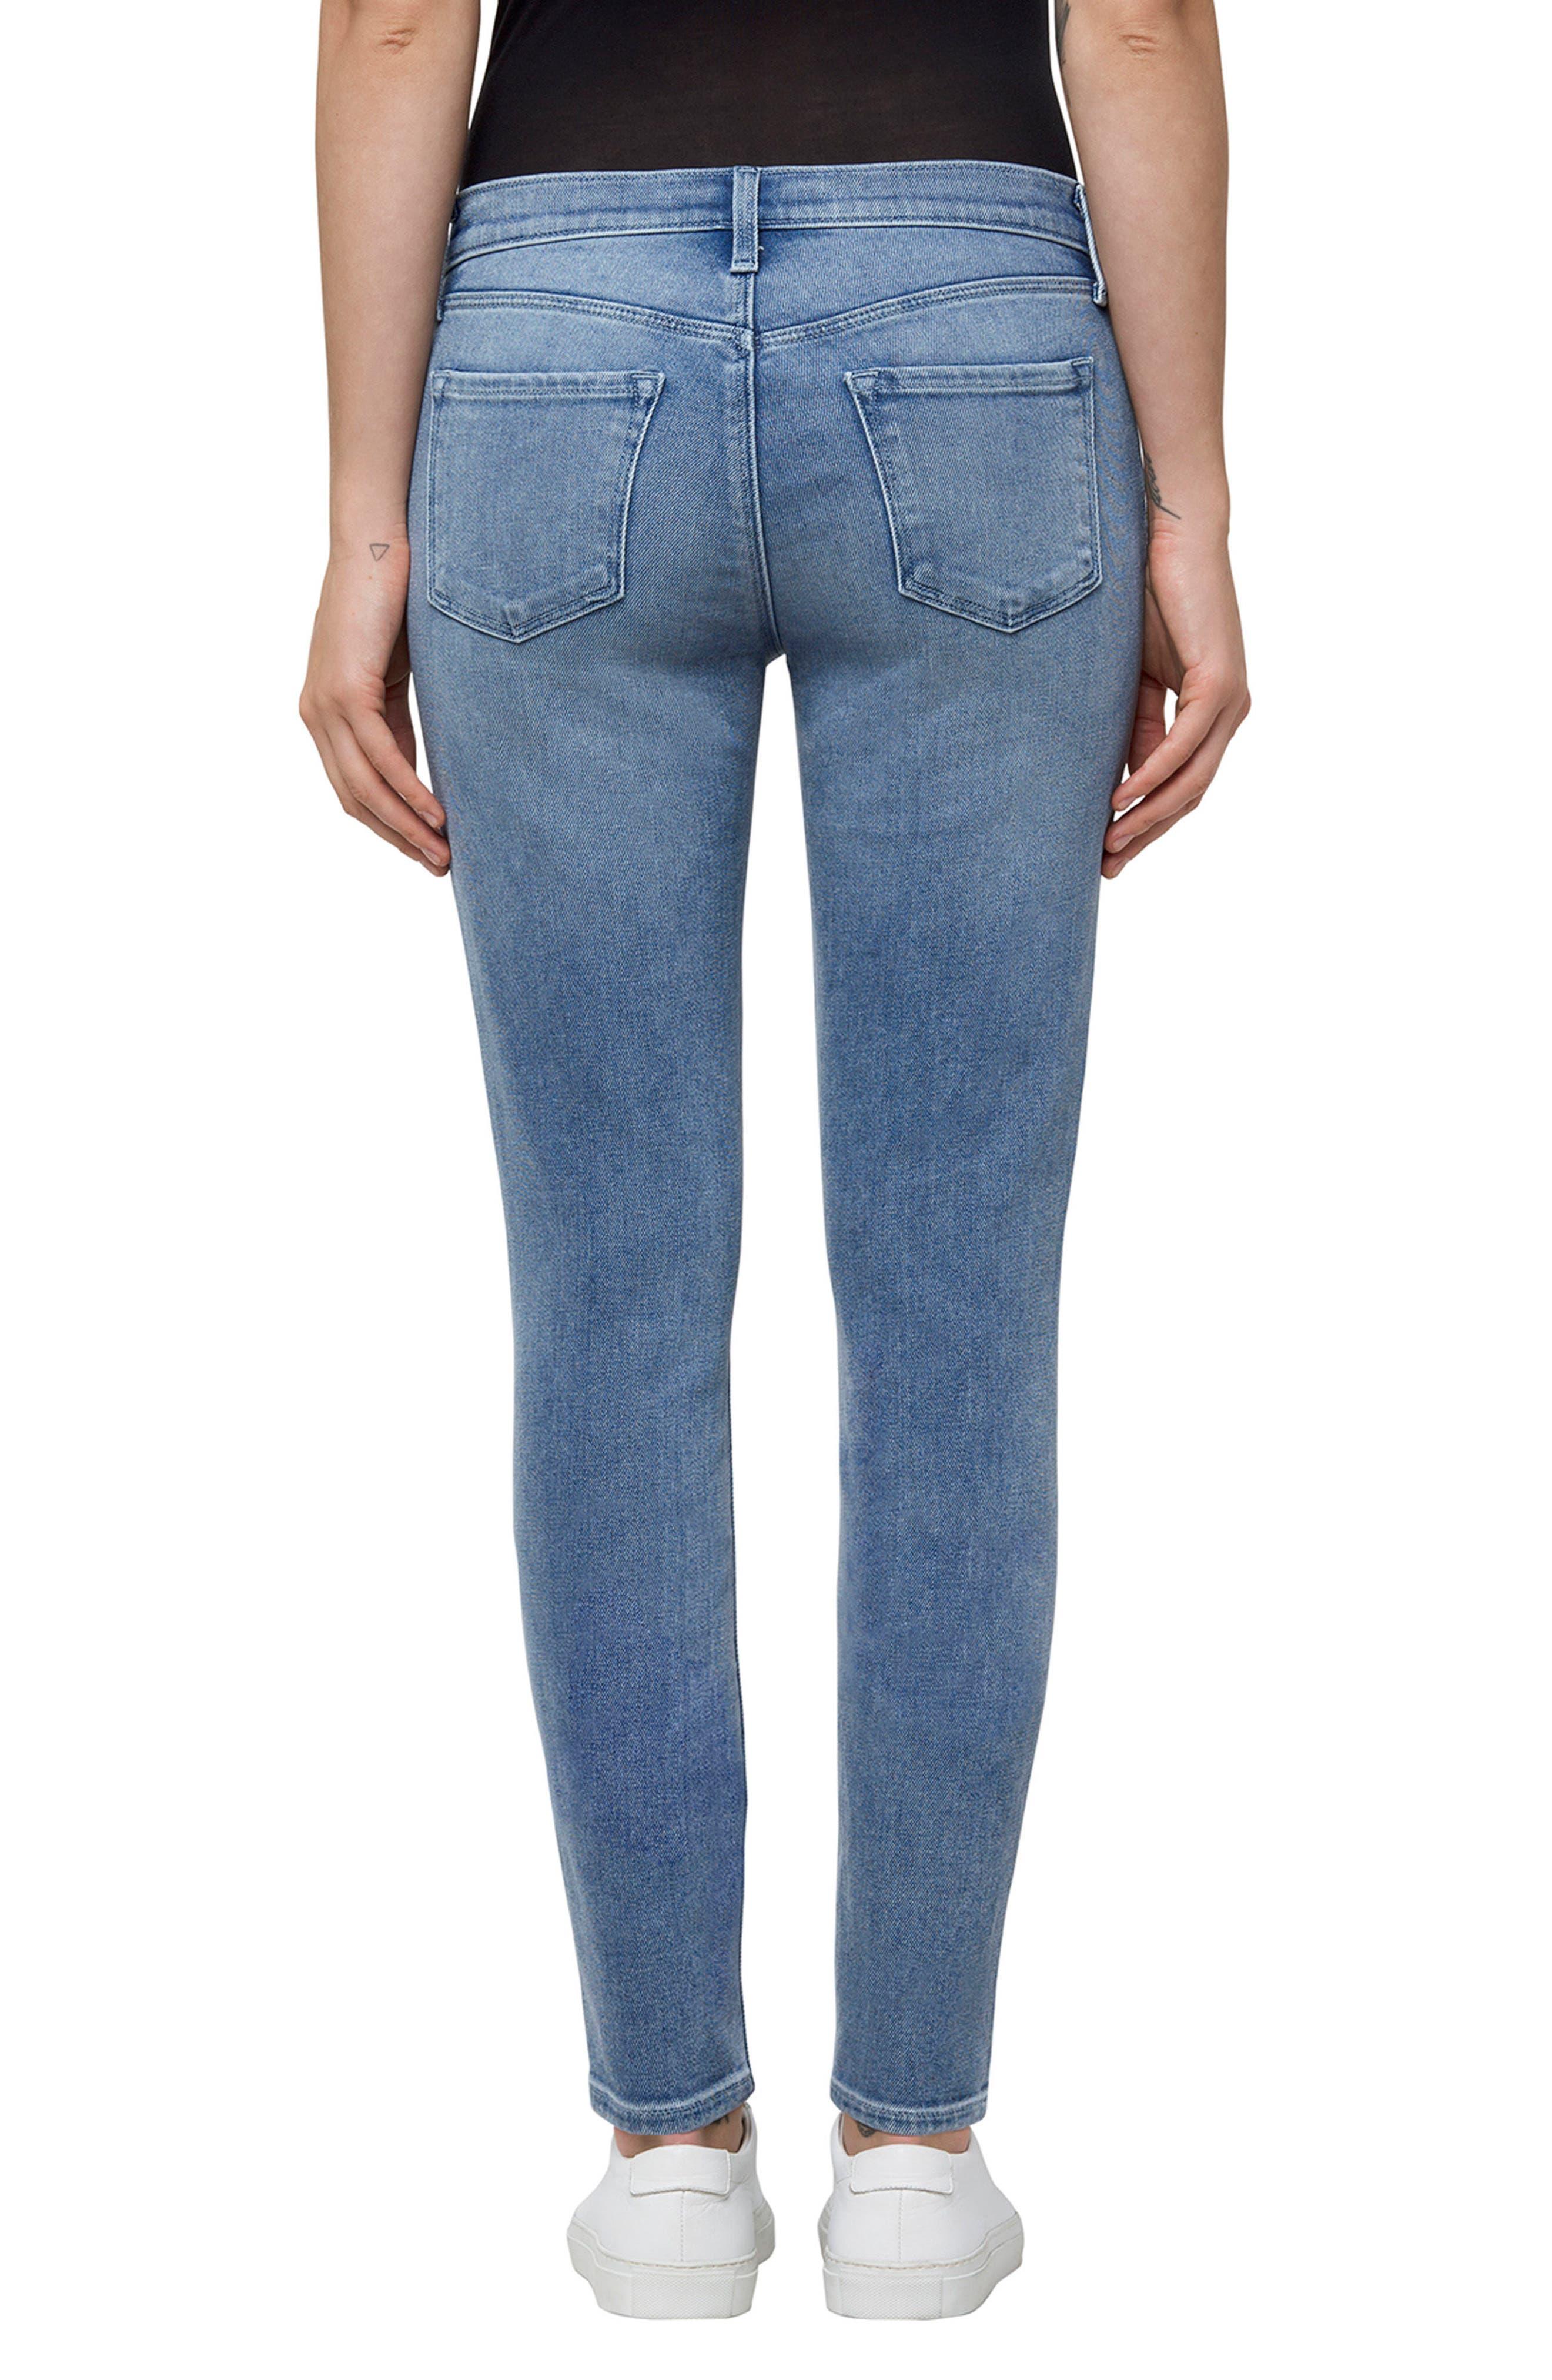 811 Skinny Jeans,                             Alternate thumbnail 2, color,                             455